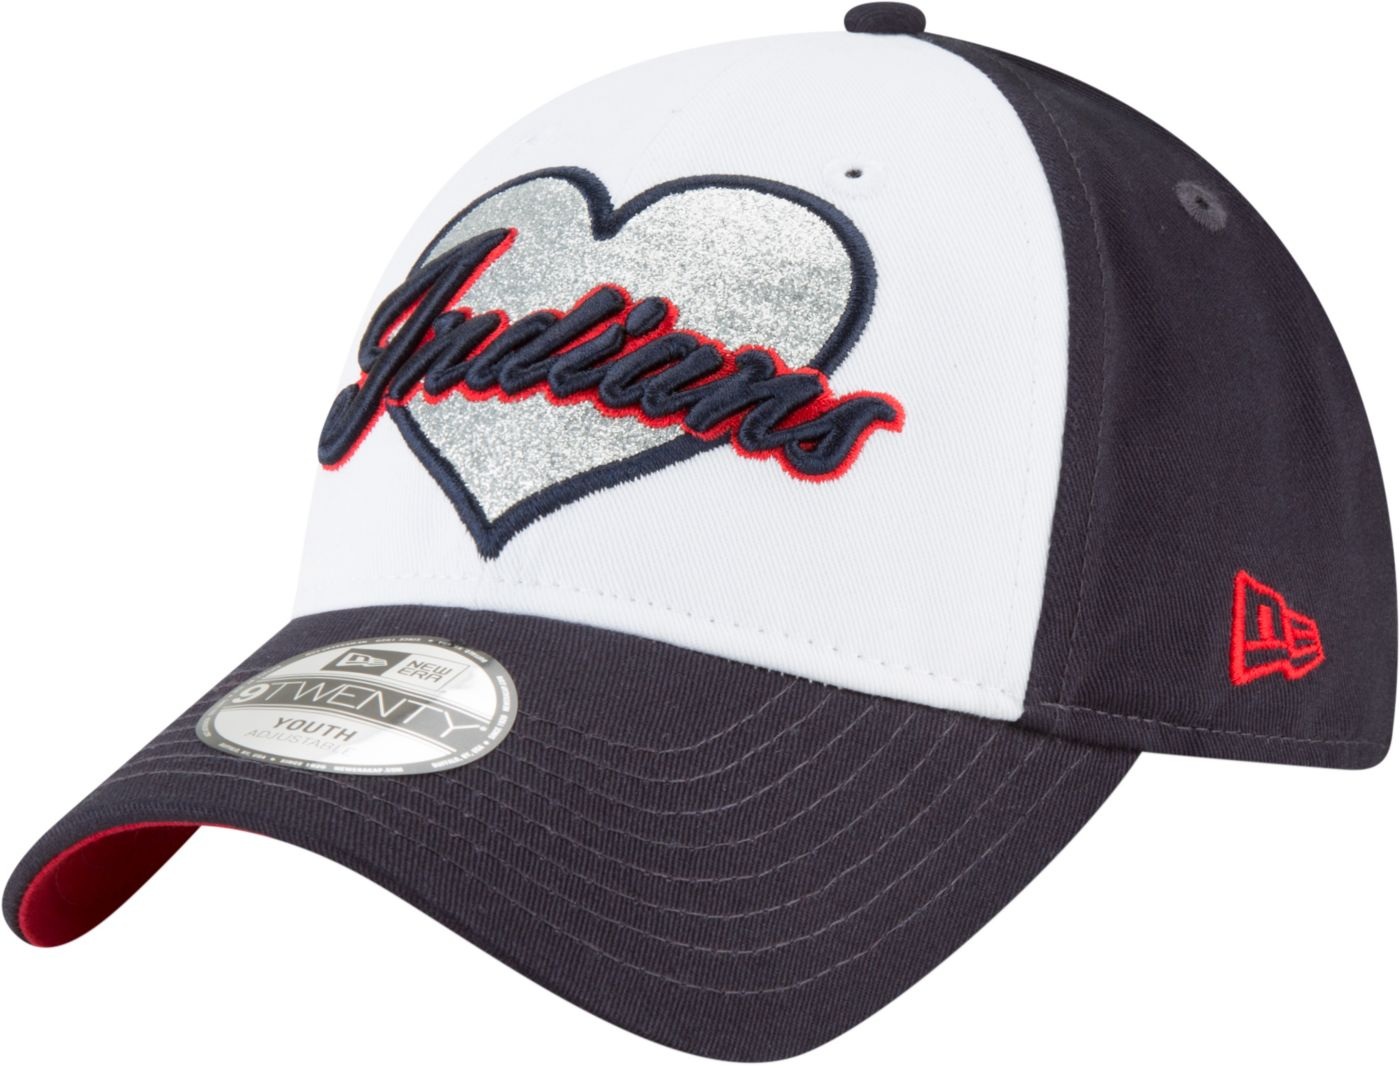 New Era Youth Cleveland Indians 9Twenty Sparkly Fan Adjustable Hat